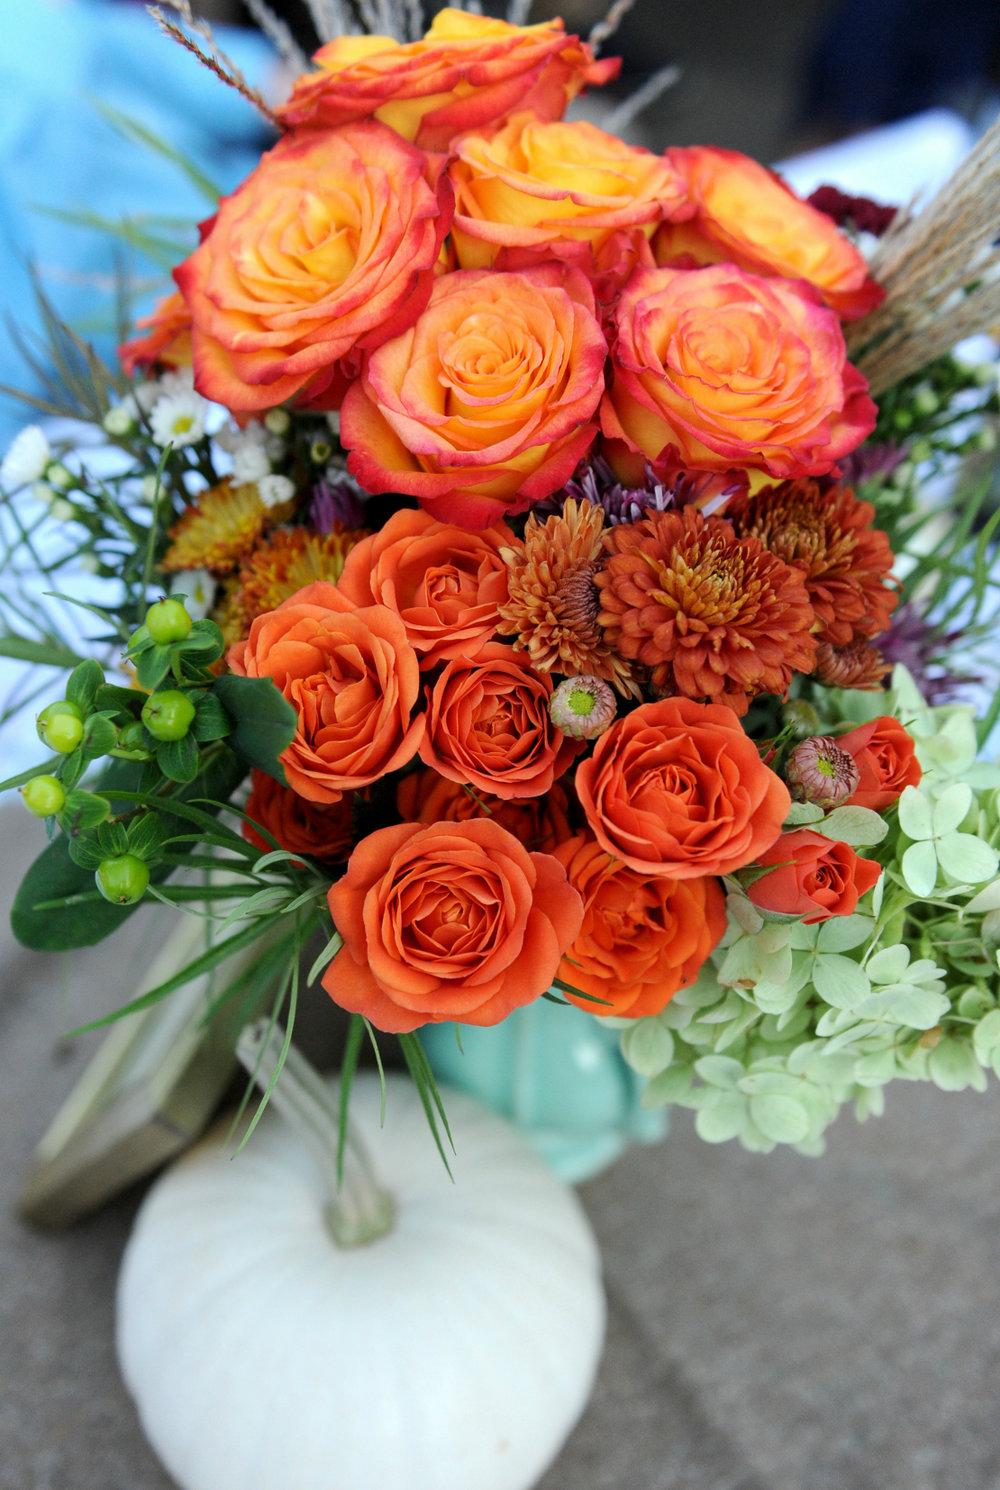 floral-1016 copy.jpg